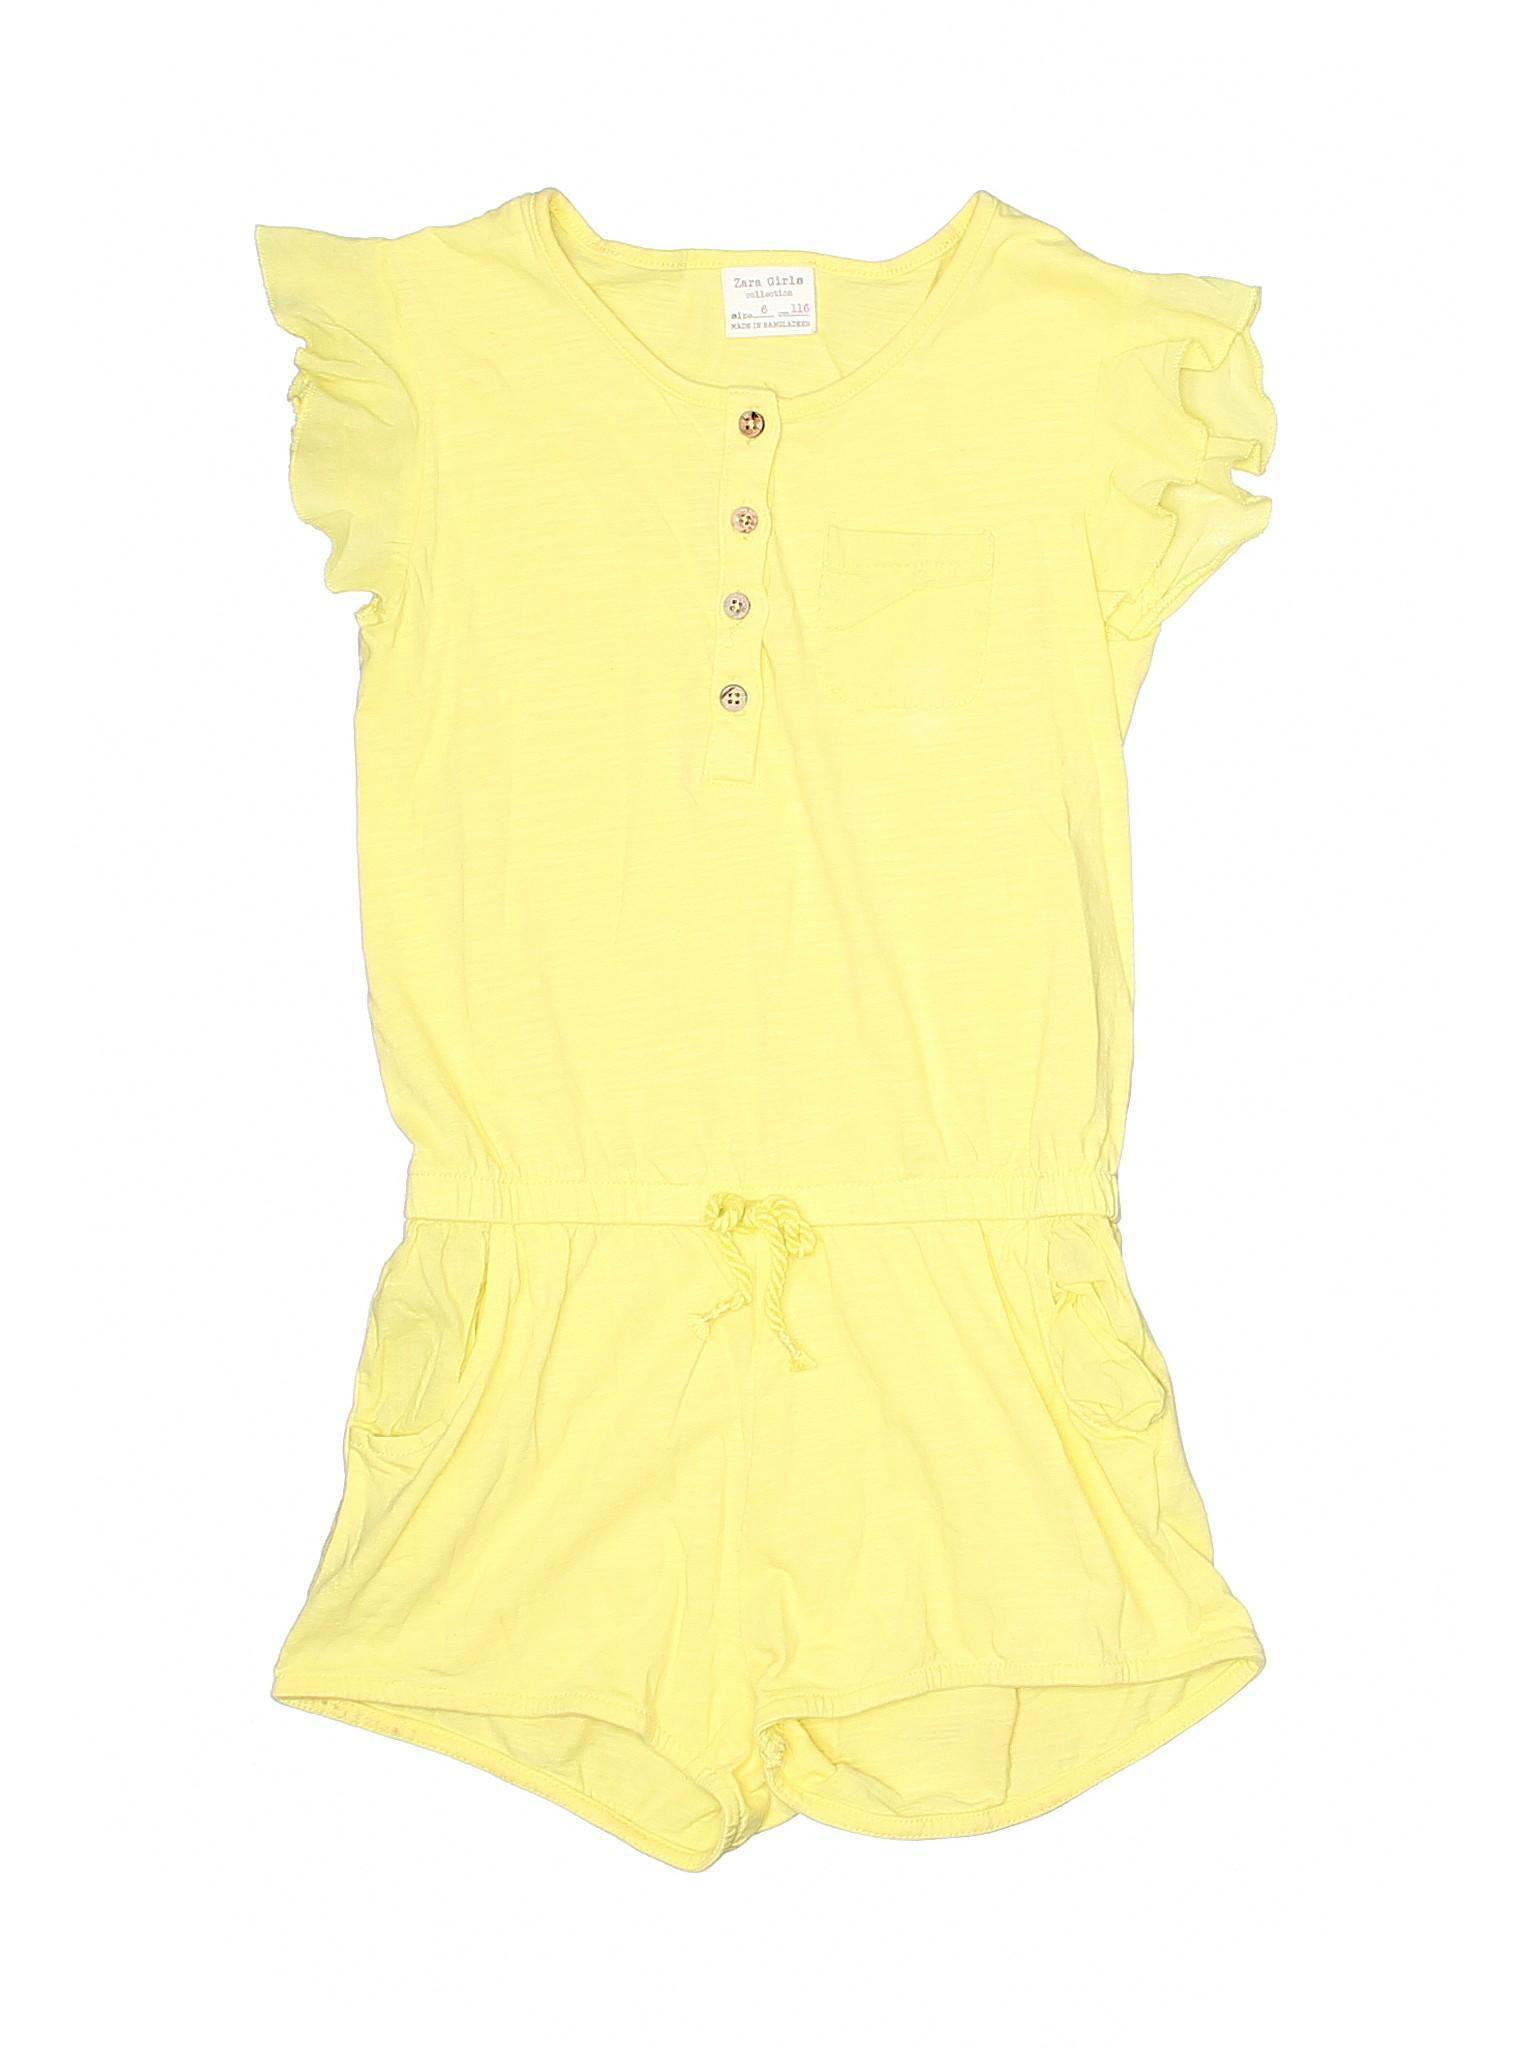 a6dbe07e0a1d Zara 100% Cotton Solid Yellow Romper Size 6 - 76% off